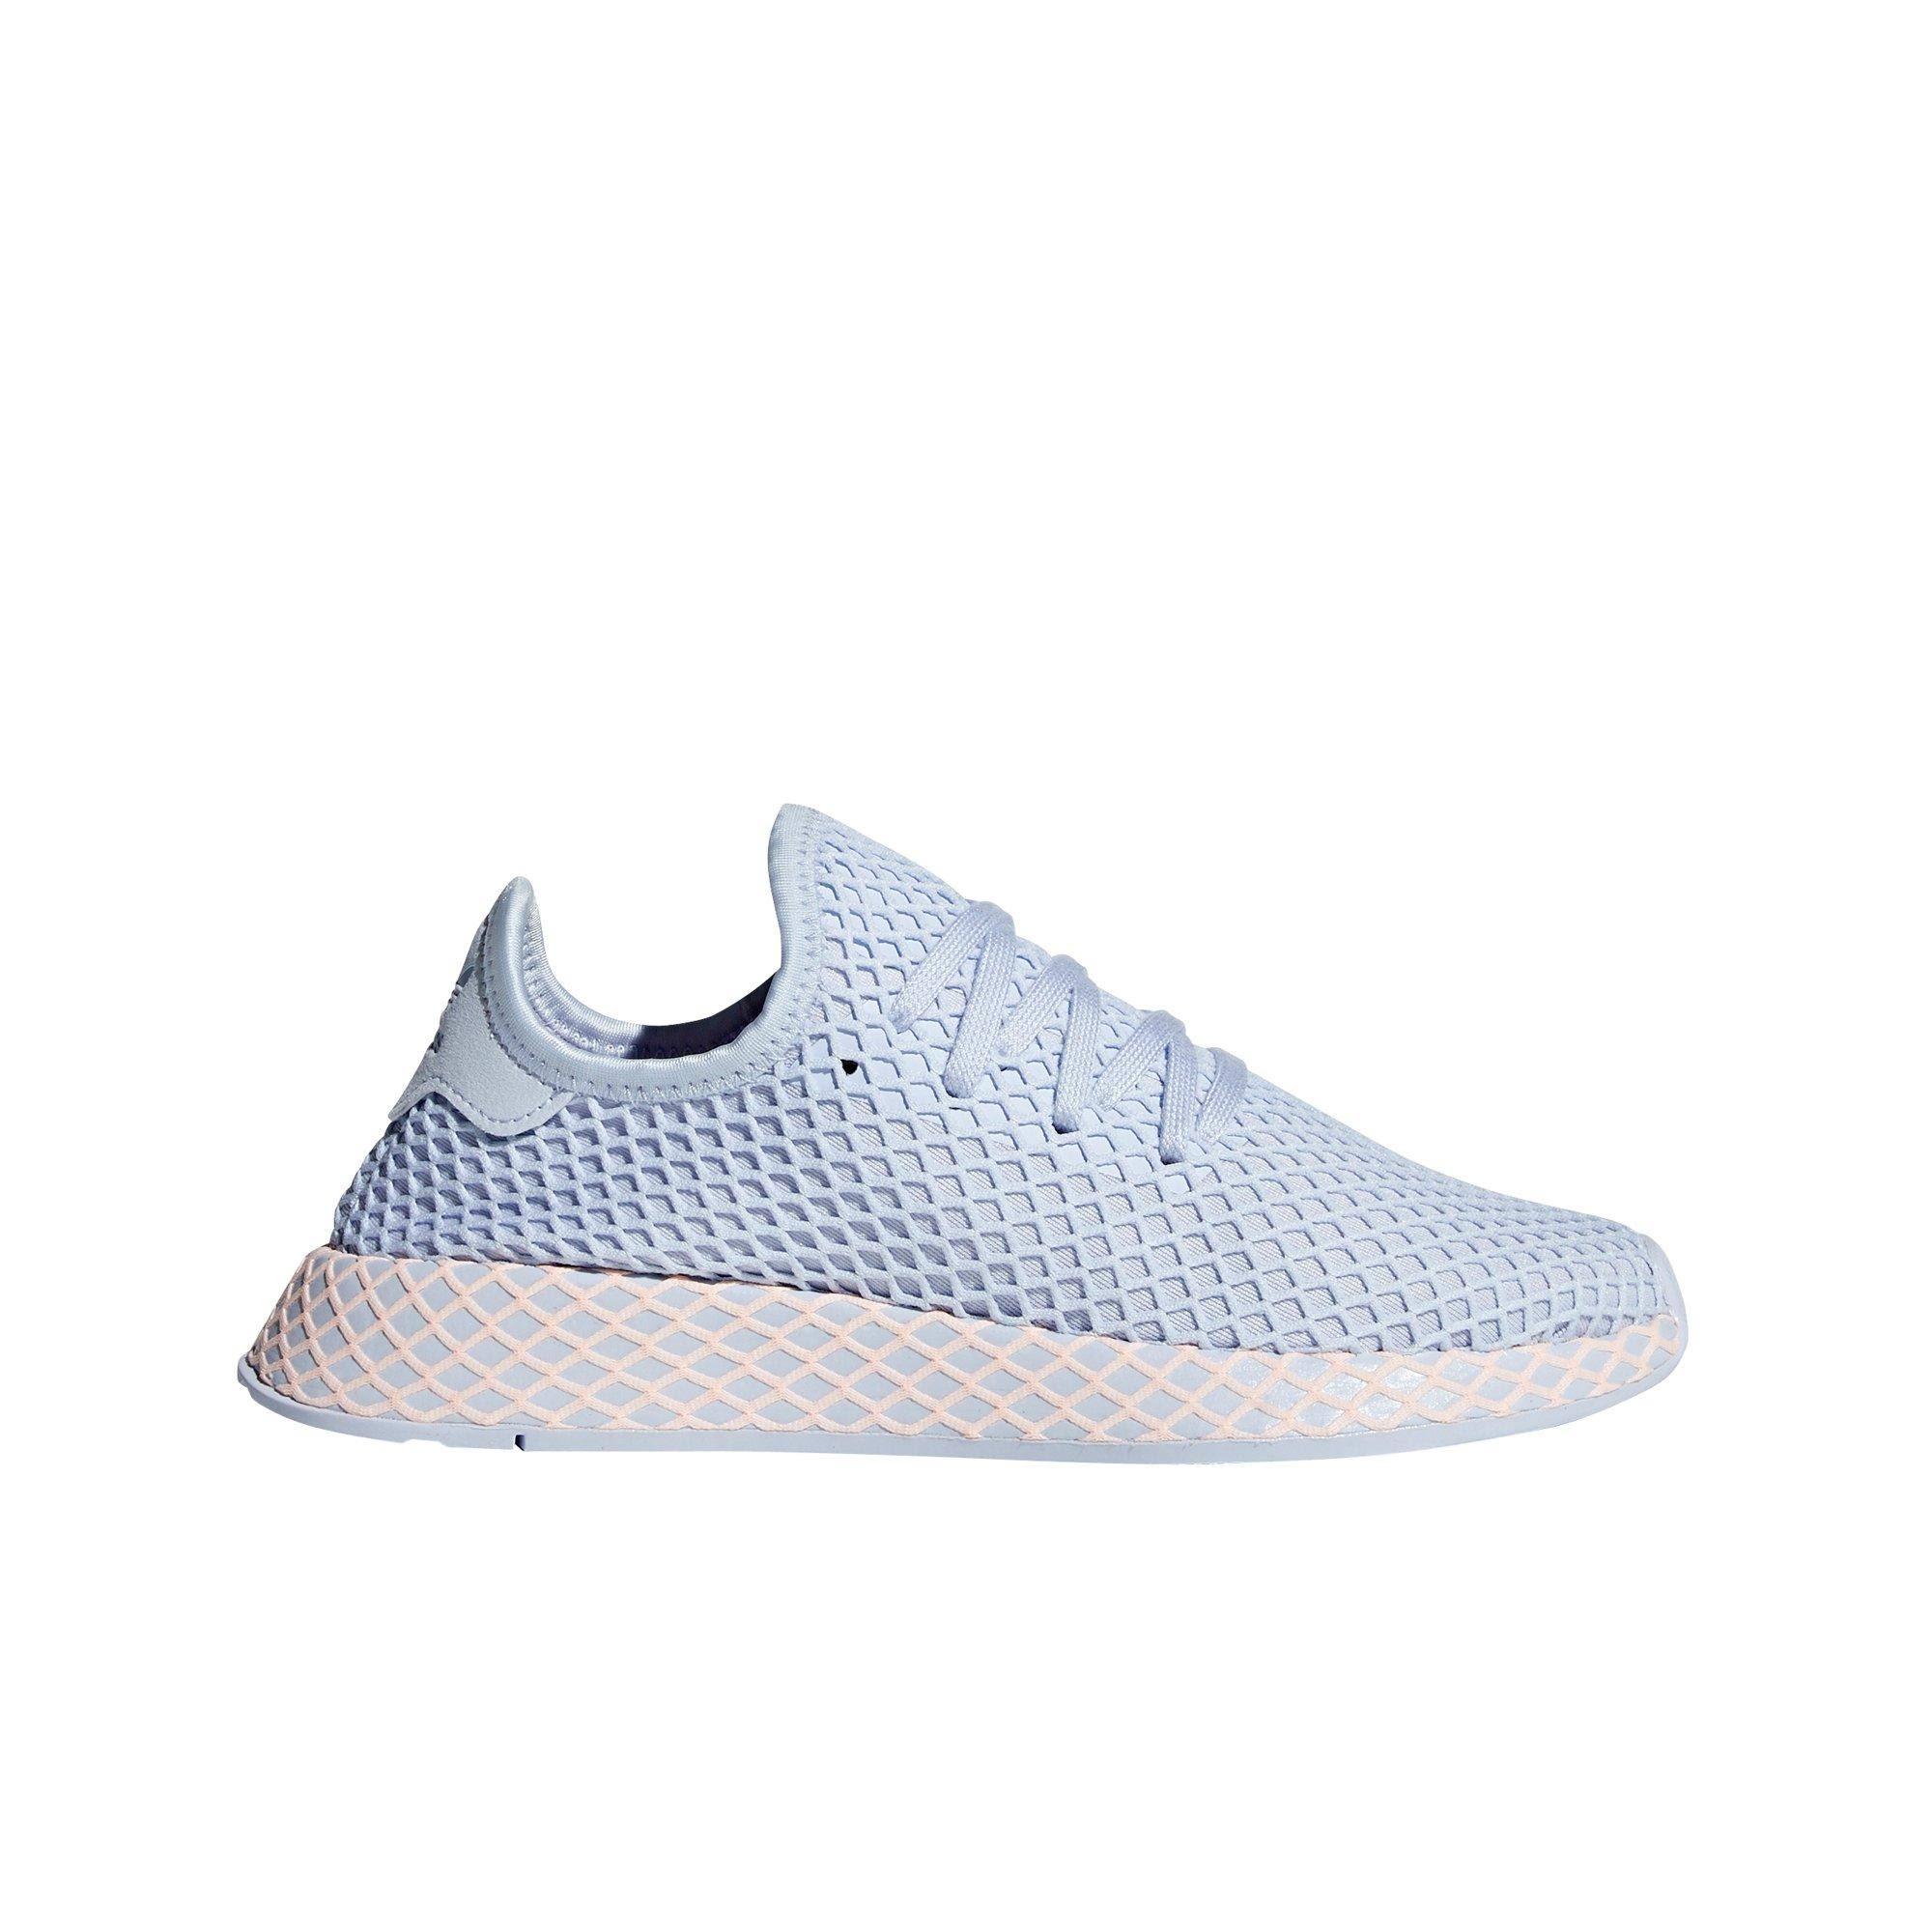 Mujer Originals 5 B37878 Runner Deerupt Tamaño 10 Para Adidas Zapatos qXWYdwXz